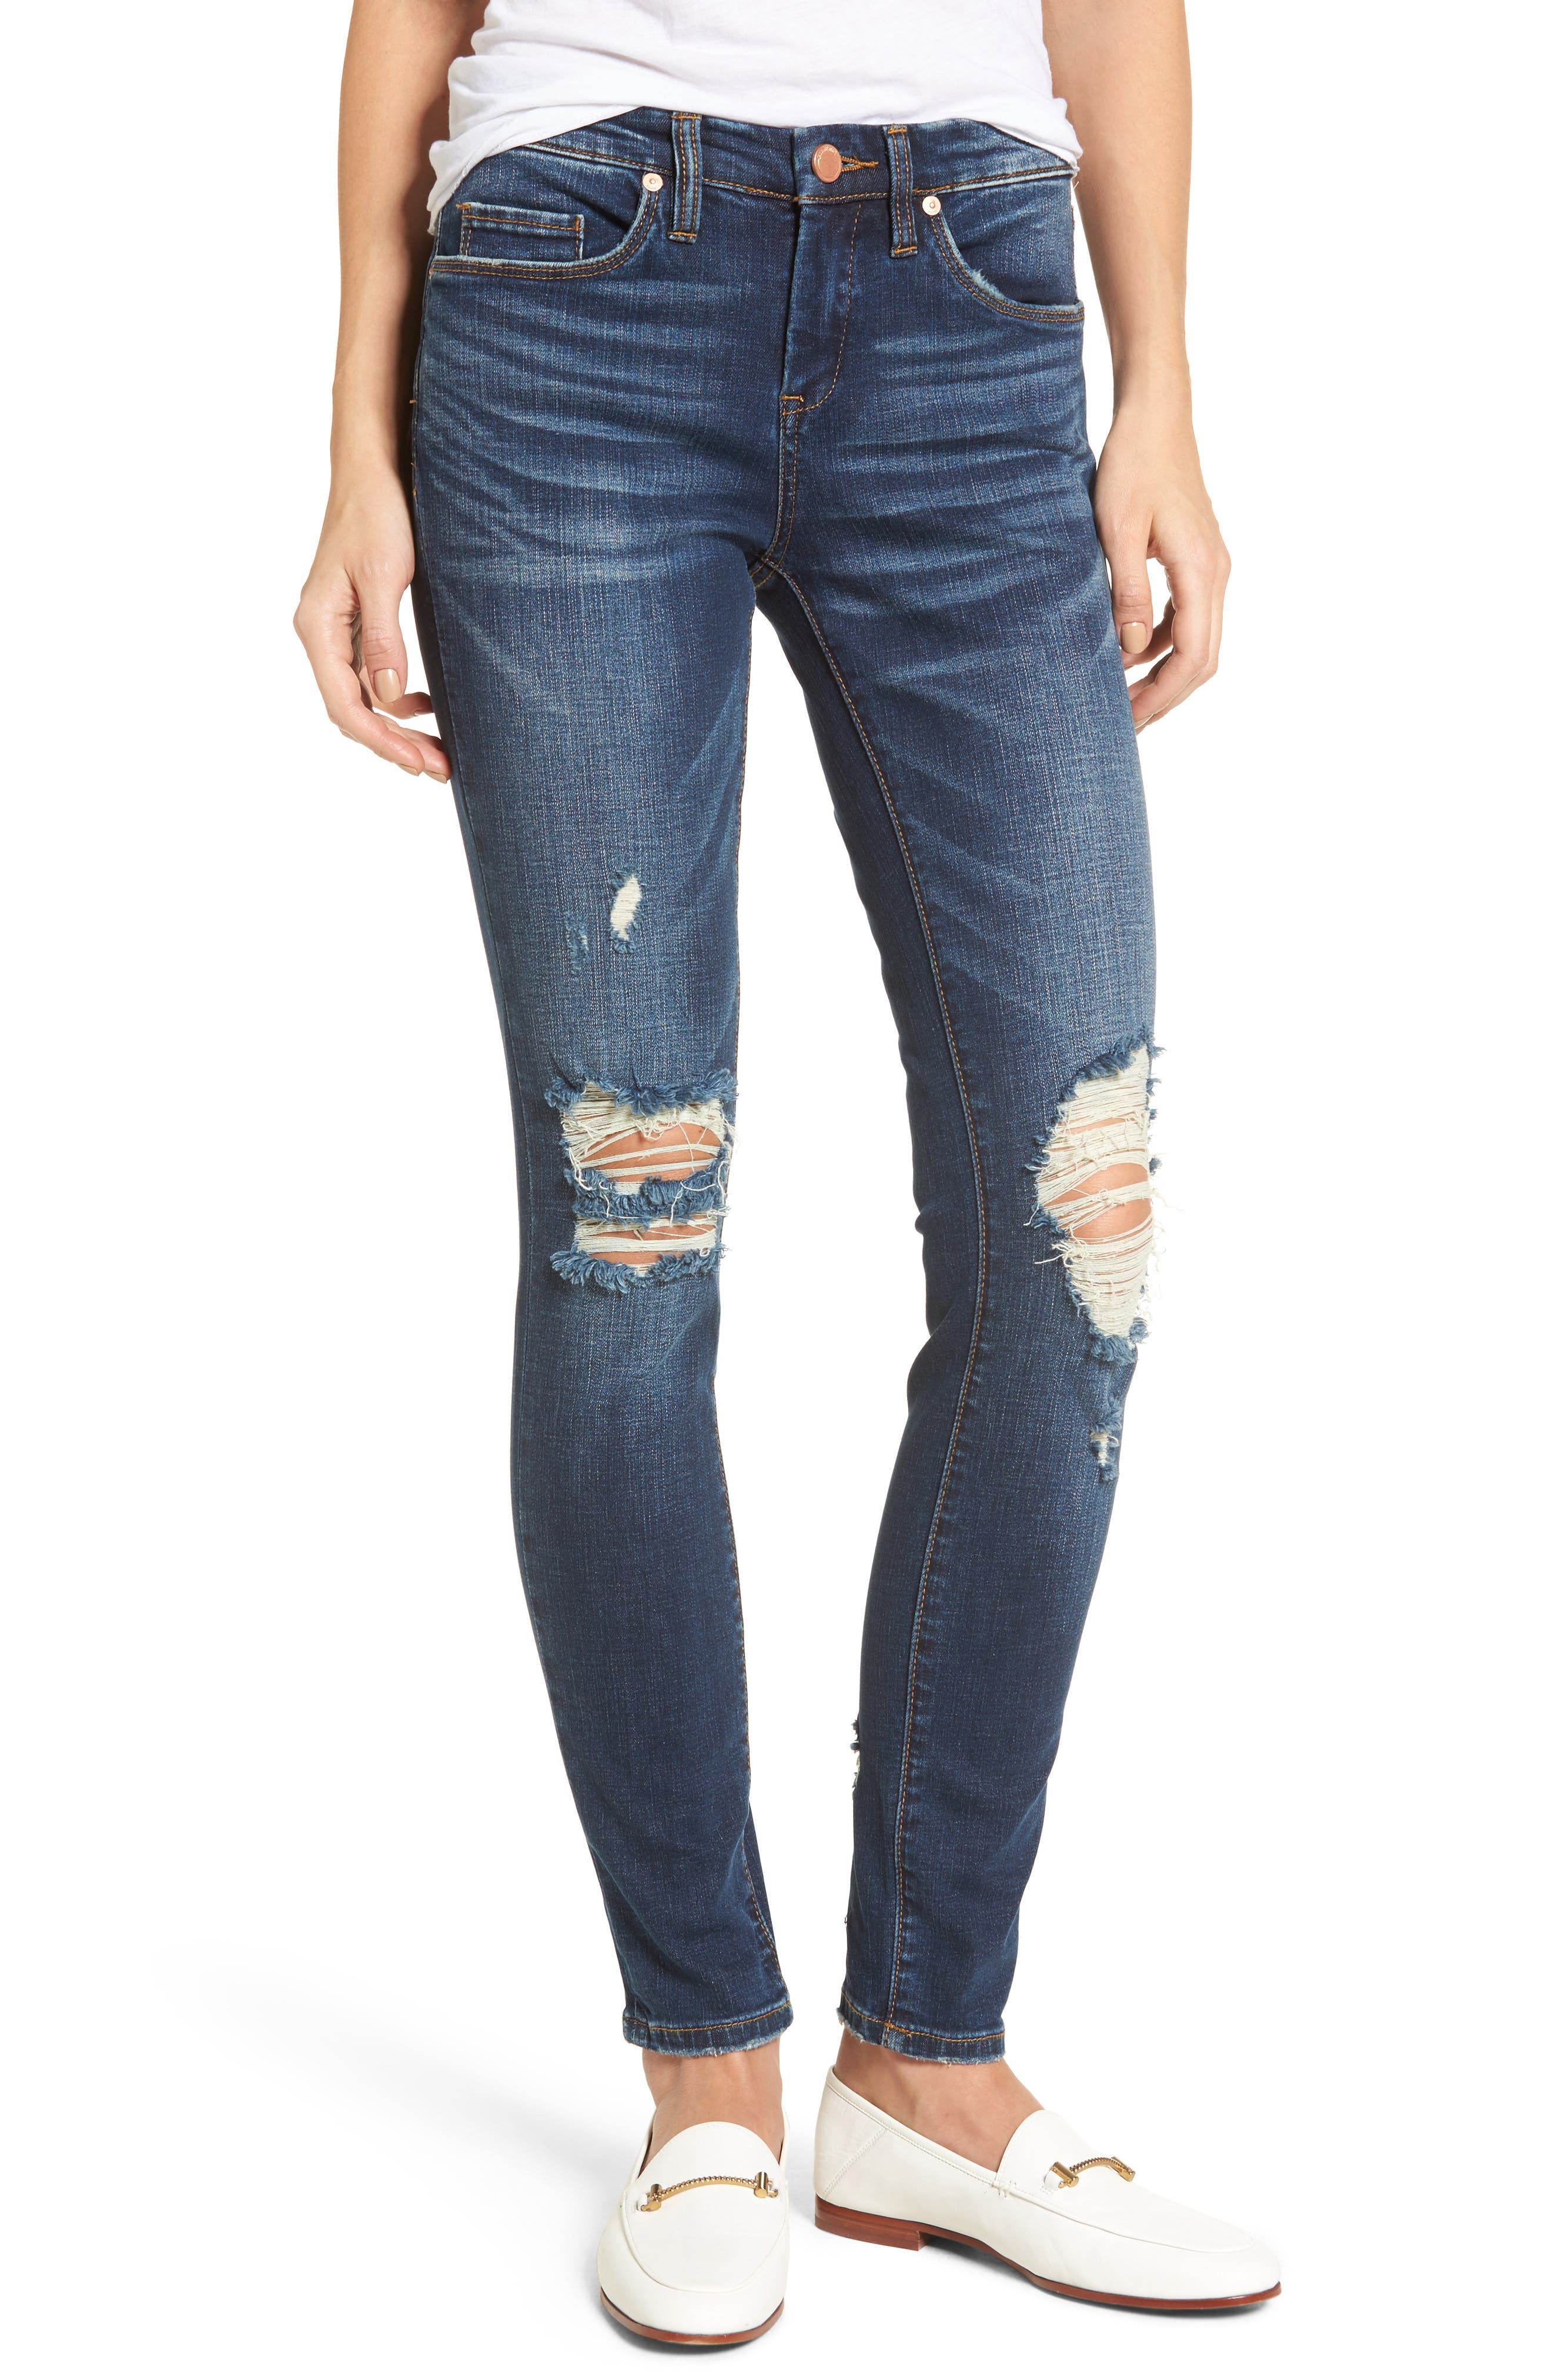 Decon Cult Classic Skinny Jeans,                         Main,                         color, Cut Classic Blue